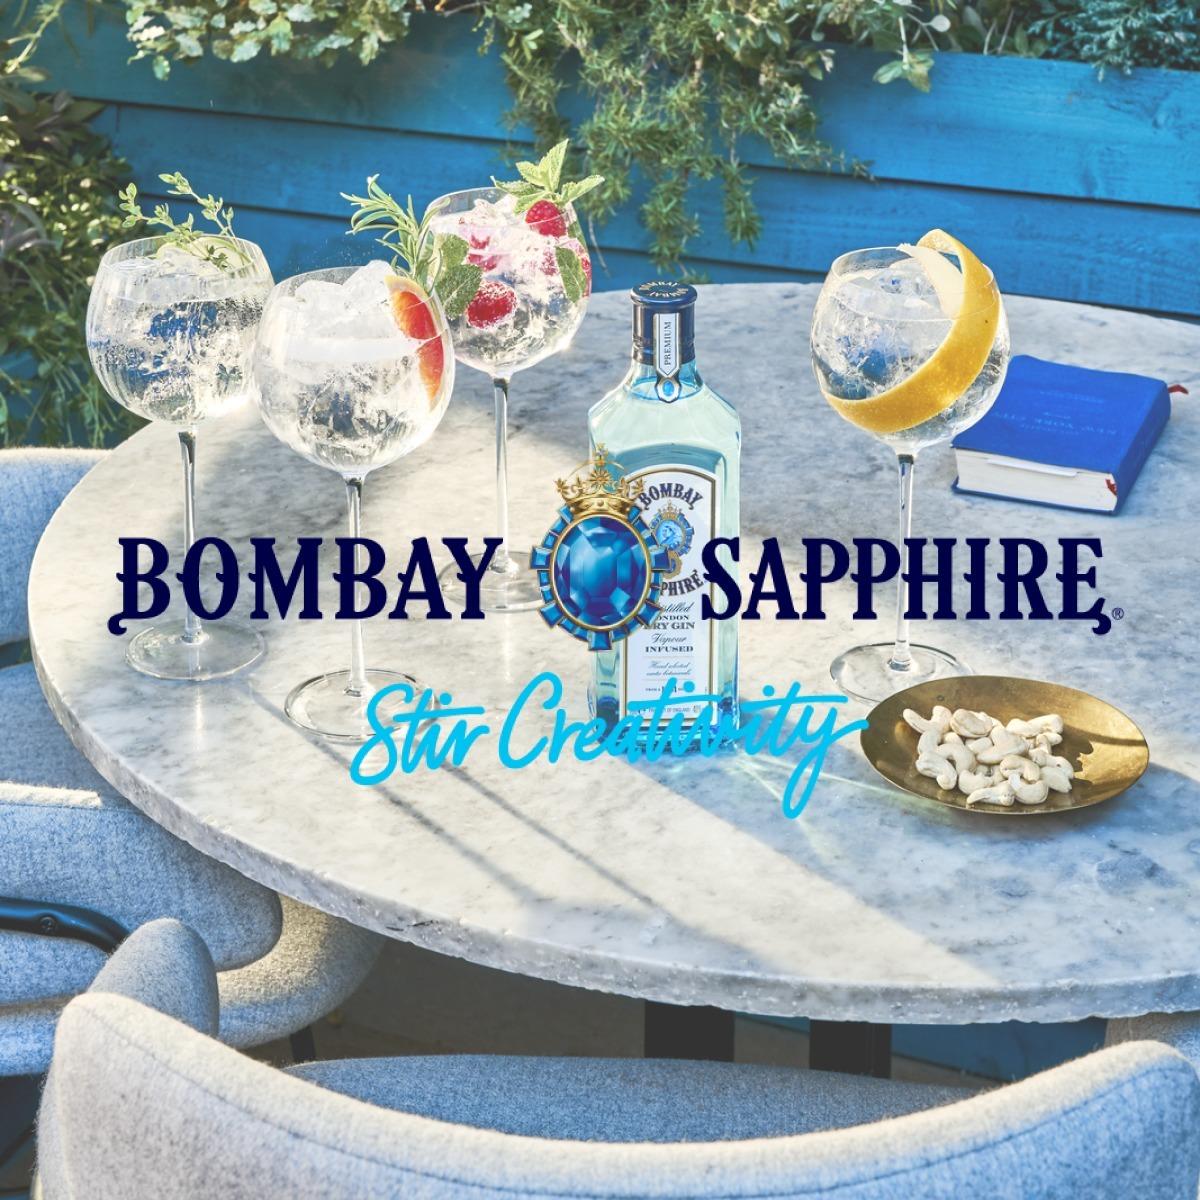 Bombay Sapphire – Stir Creativity